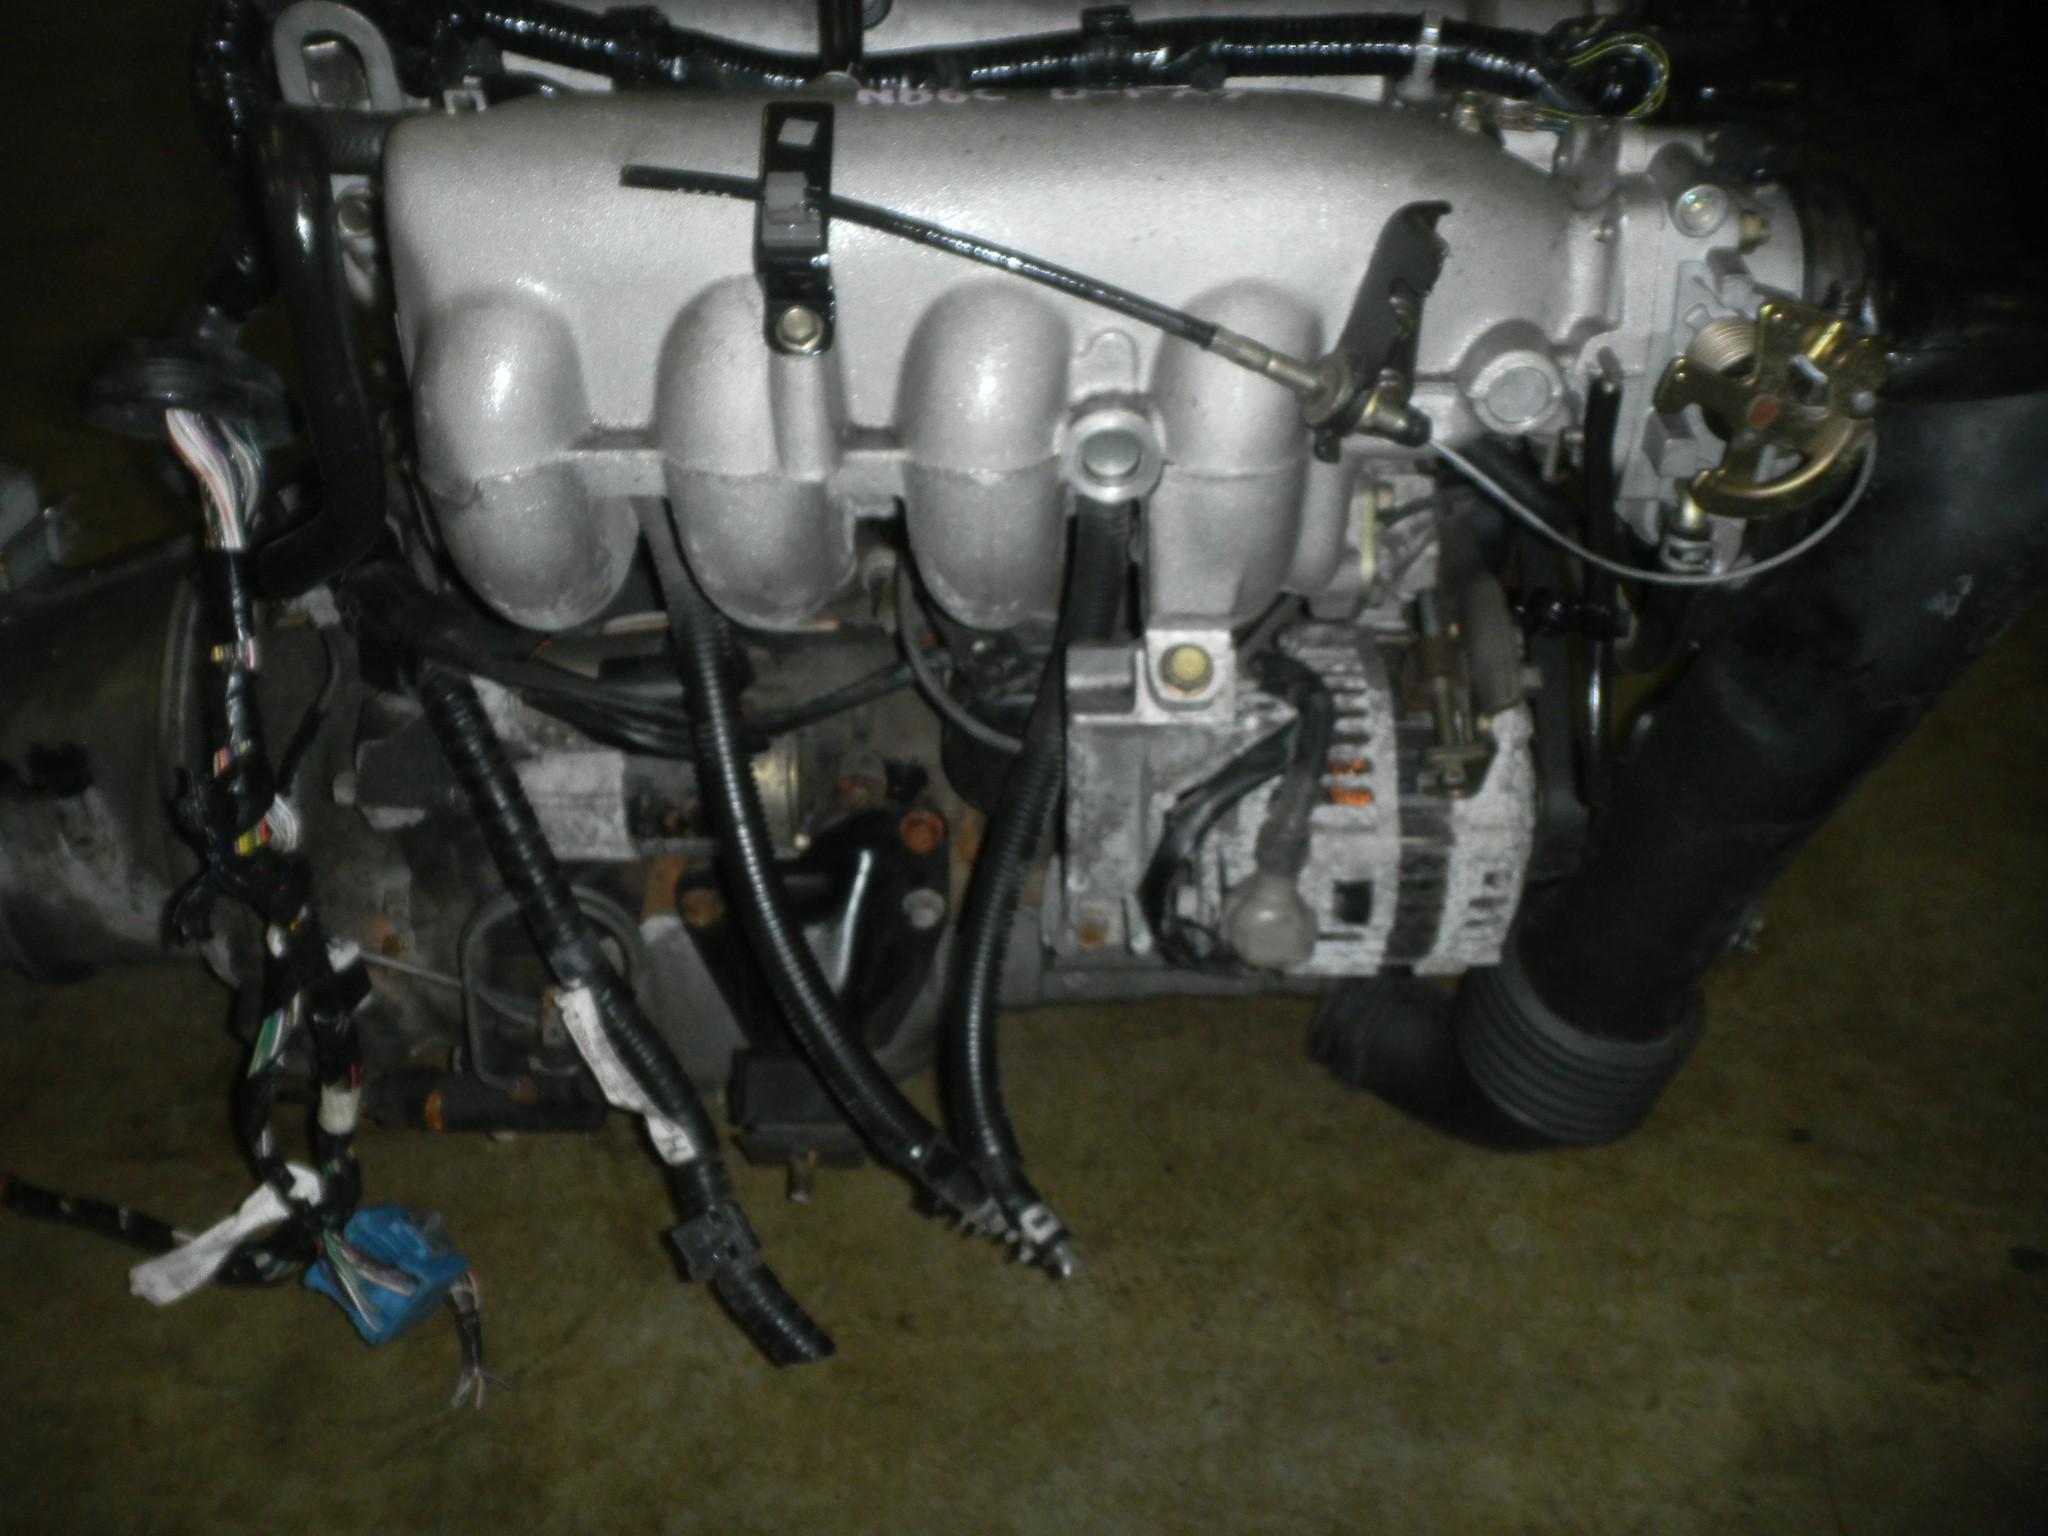 jdm mazda mx5 miata b6ze 1 6l complete swap manual ecu 90 93 engines   transmission mazda 1999 miata auto to manual swap nb miata auto to manual swap